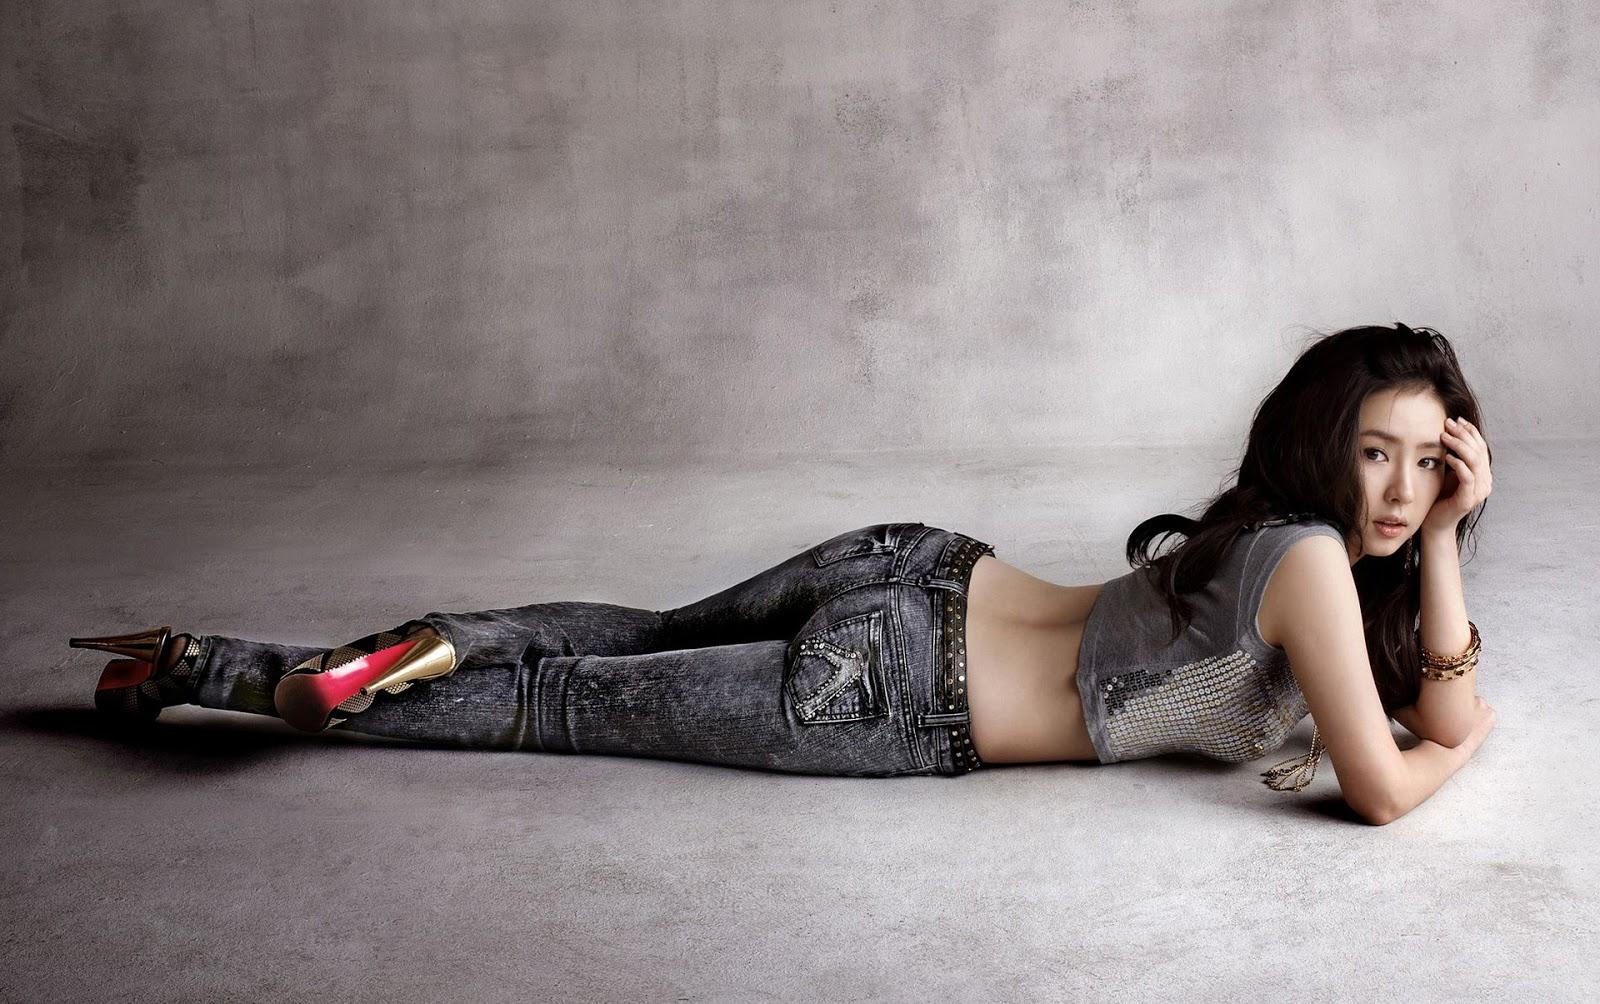 Shin Se Kyung Buckaroo Jeans Wallpaper HD + Pics | Beautiful Song